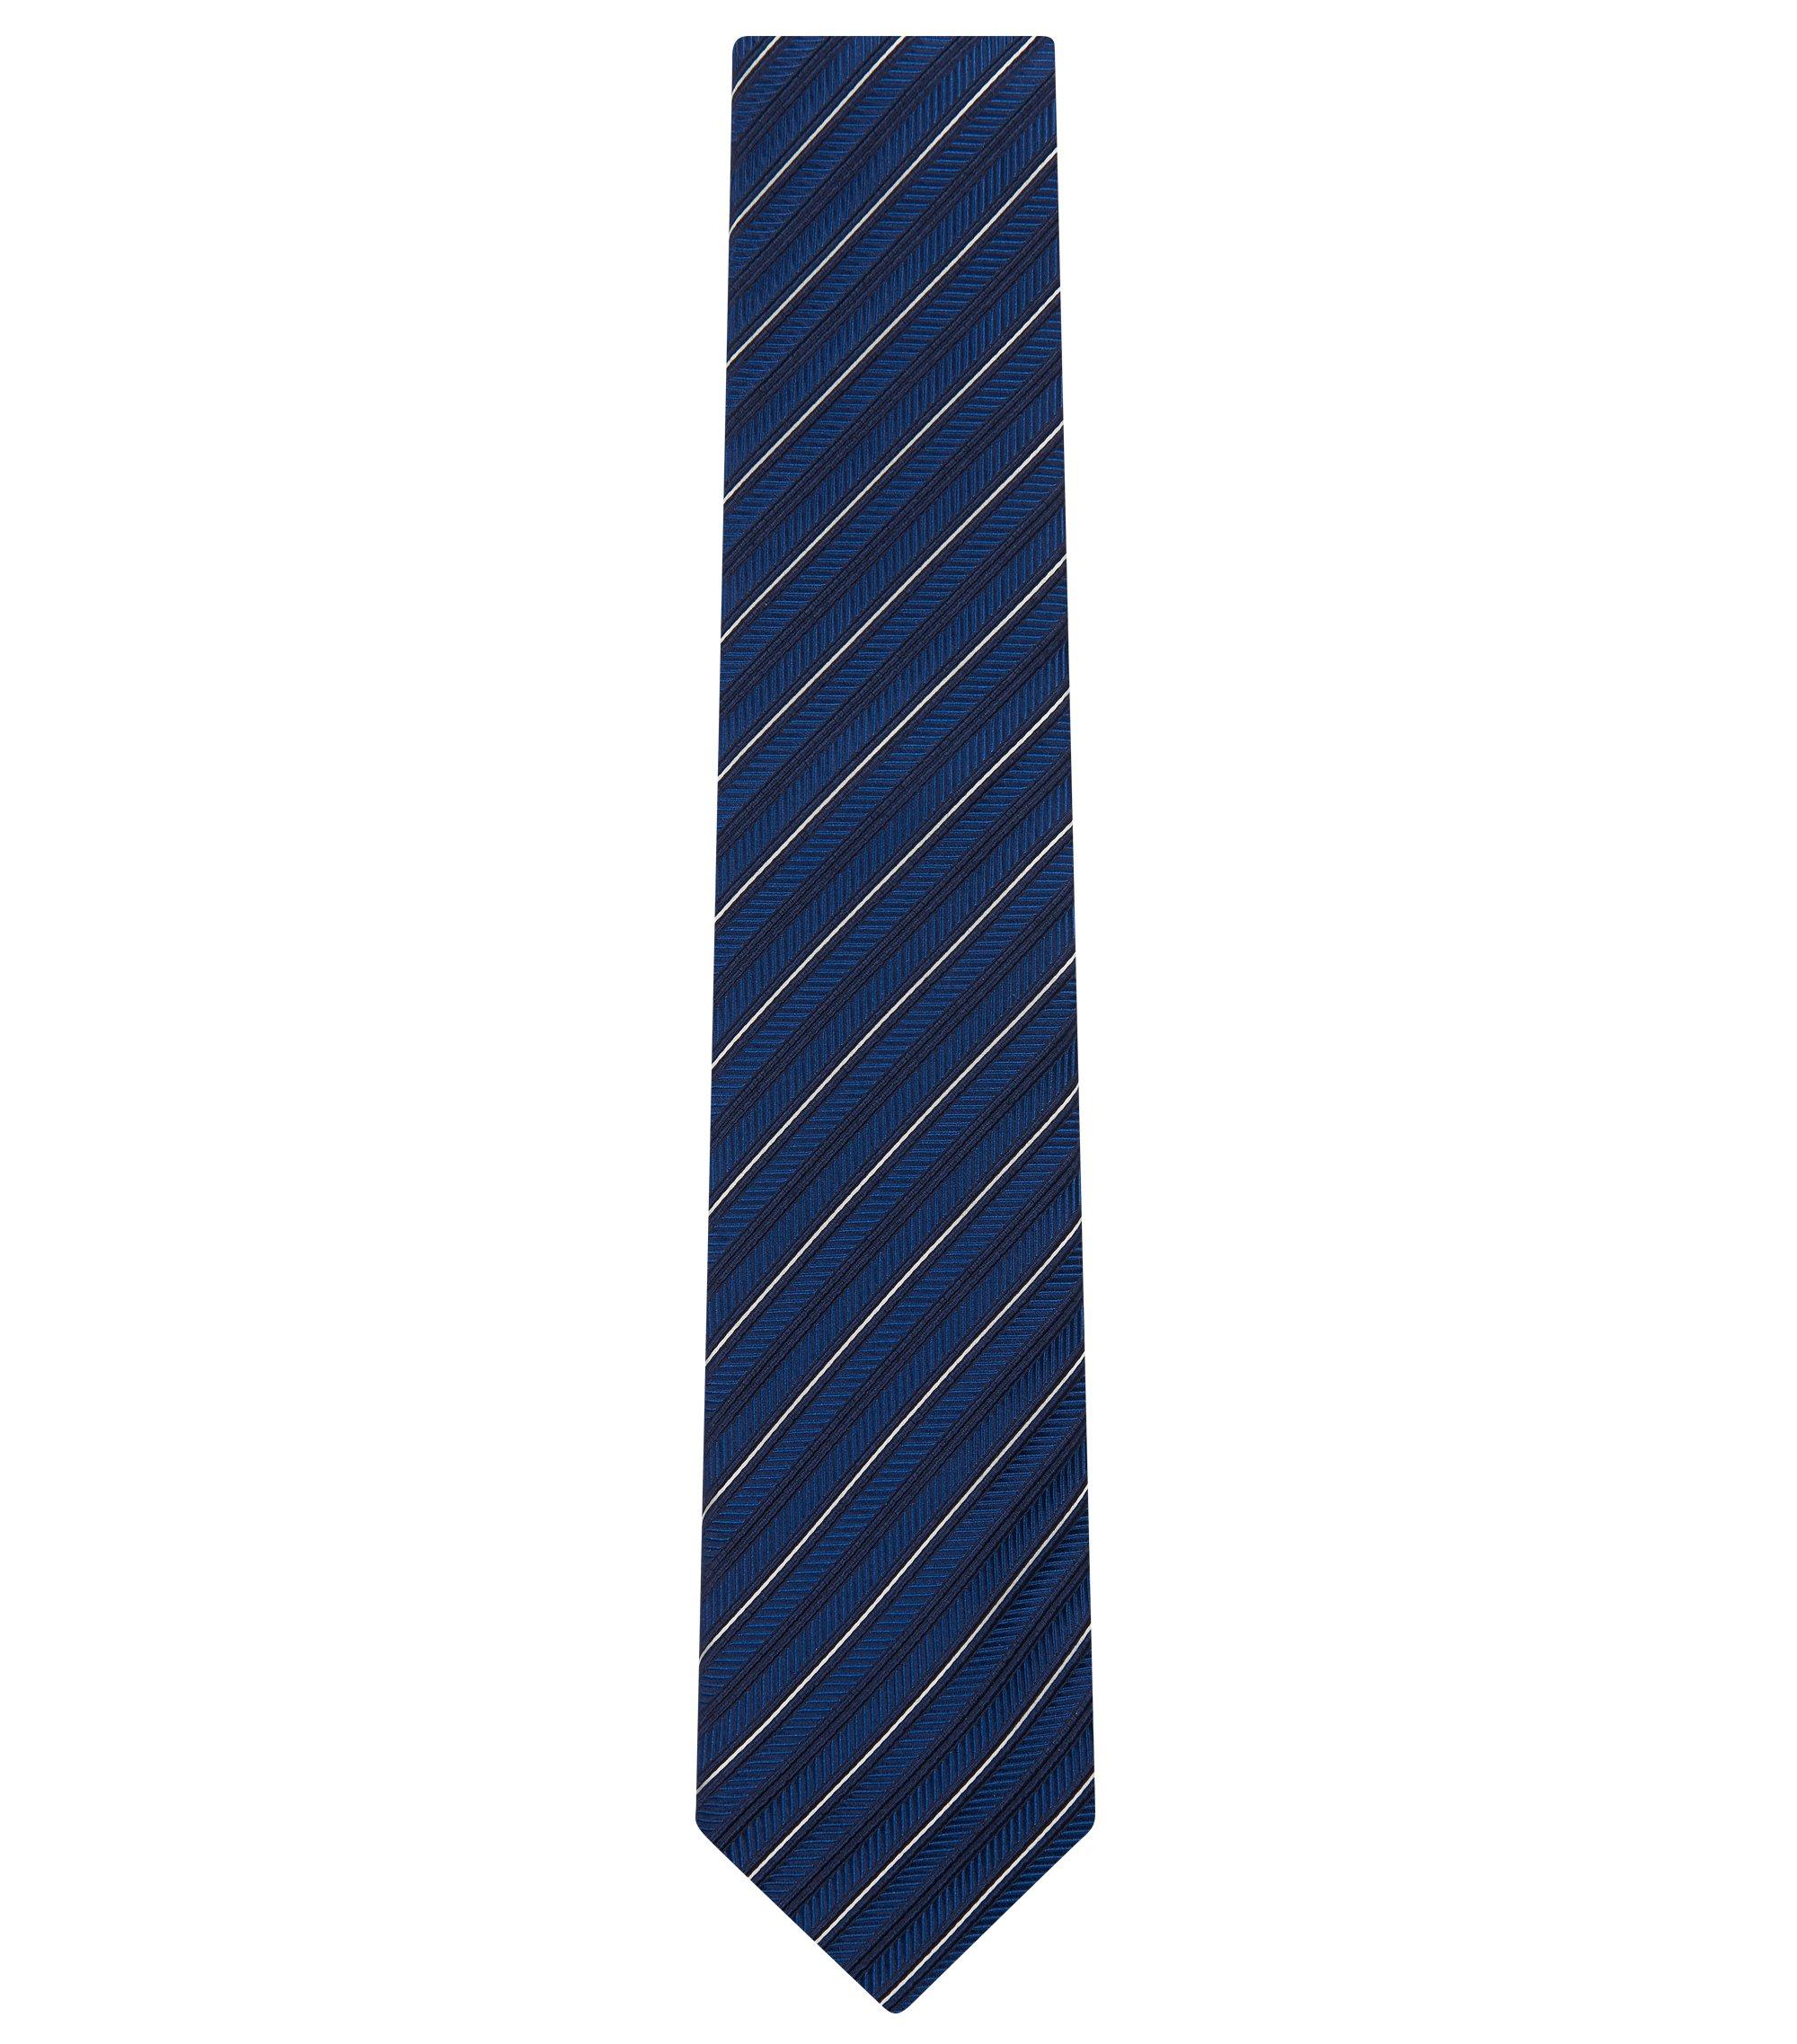 Embroidered Italian Silk Tie, Turquoise